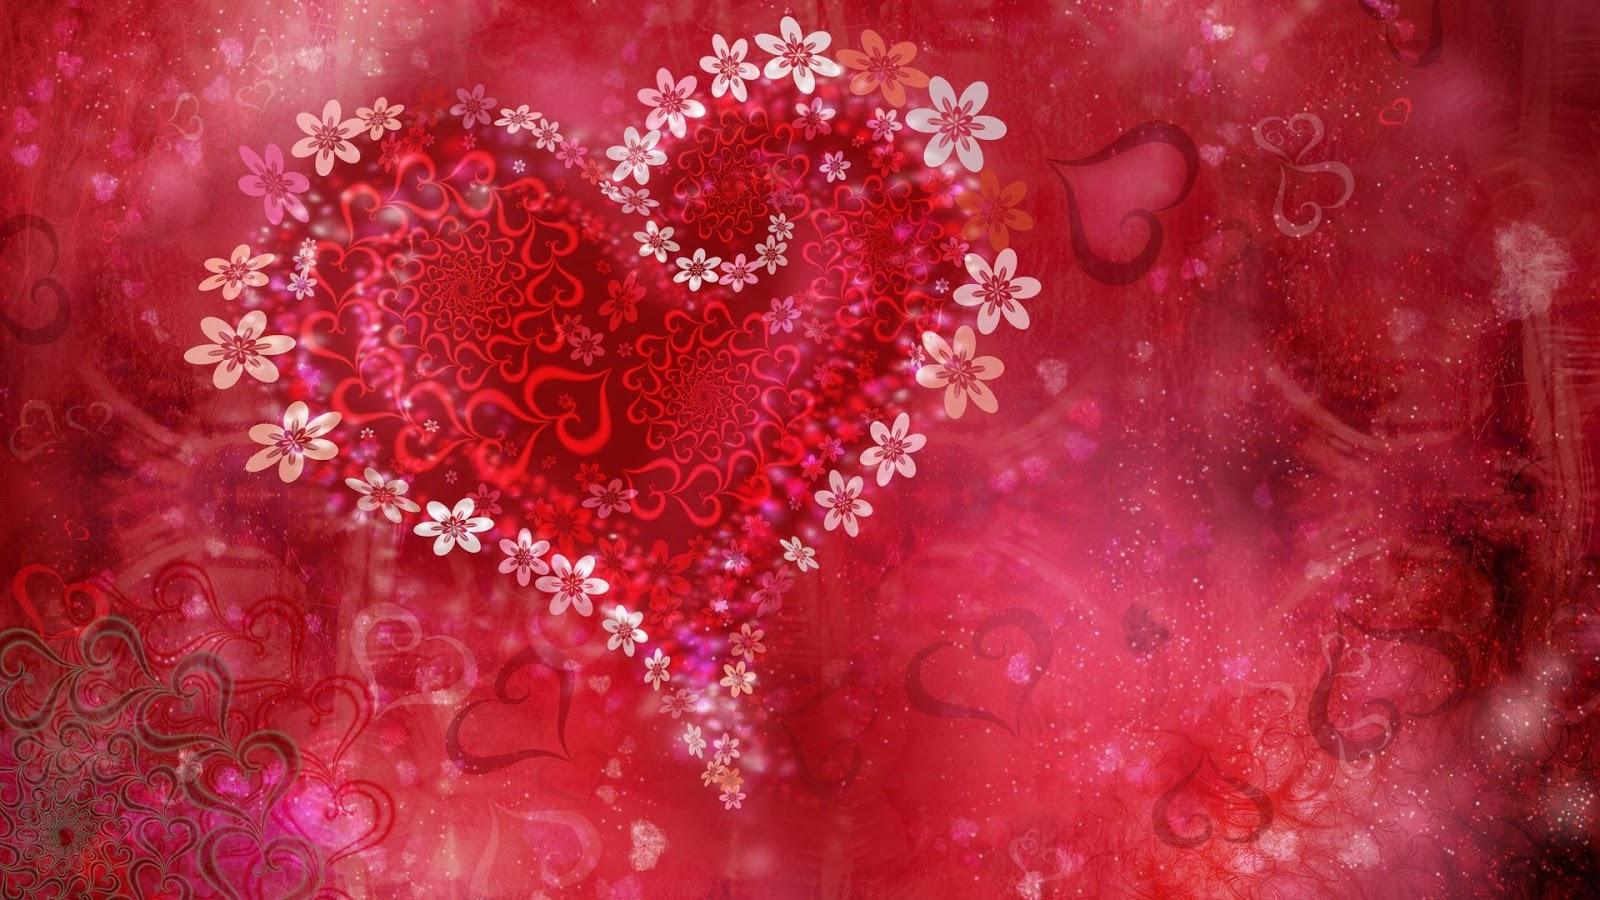 Heart Love Wallpaper Backgrounds